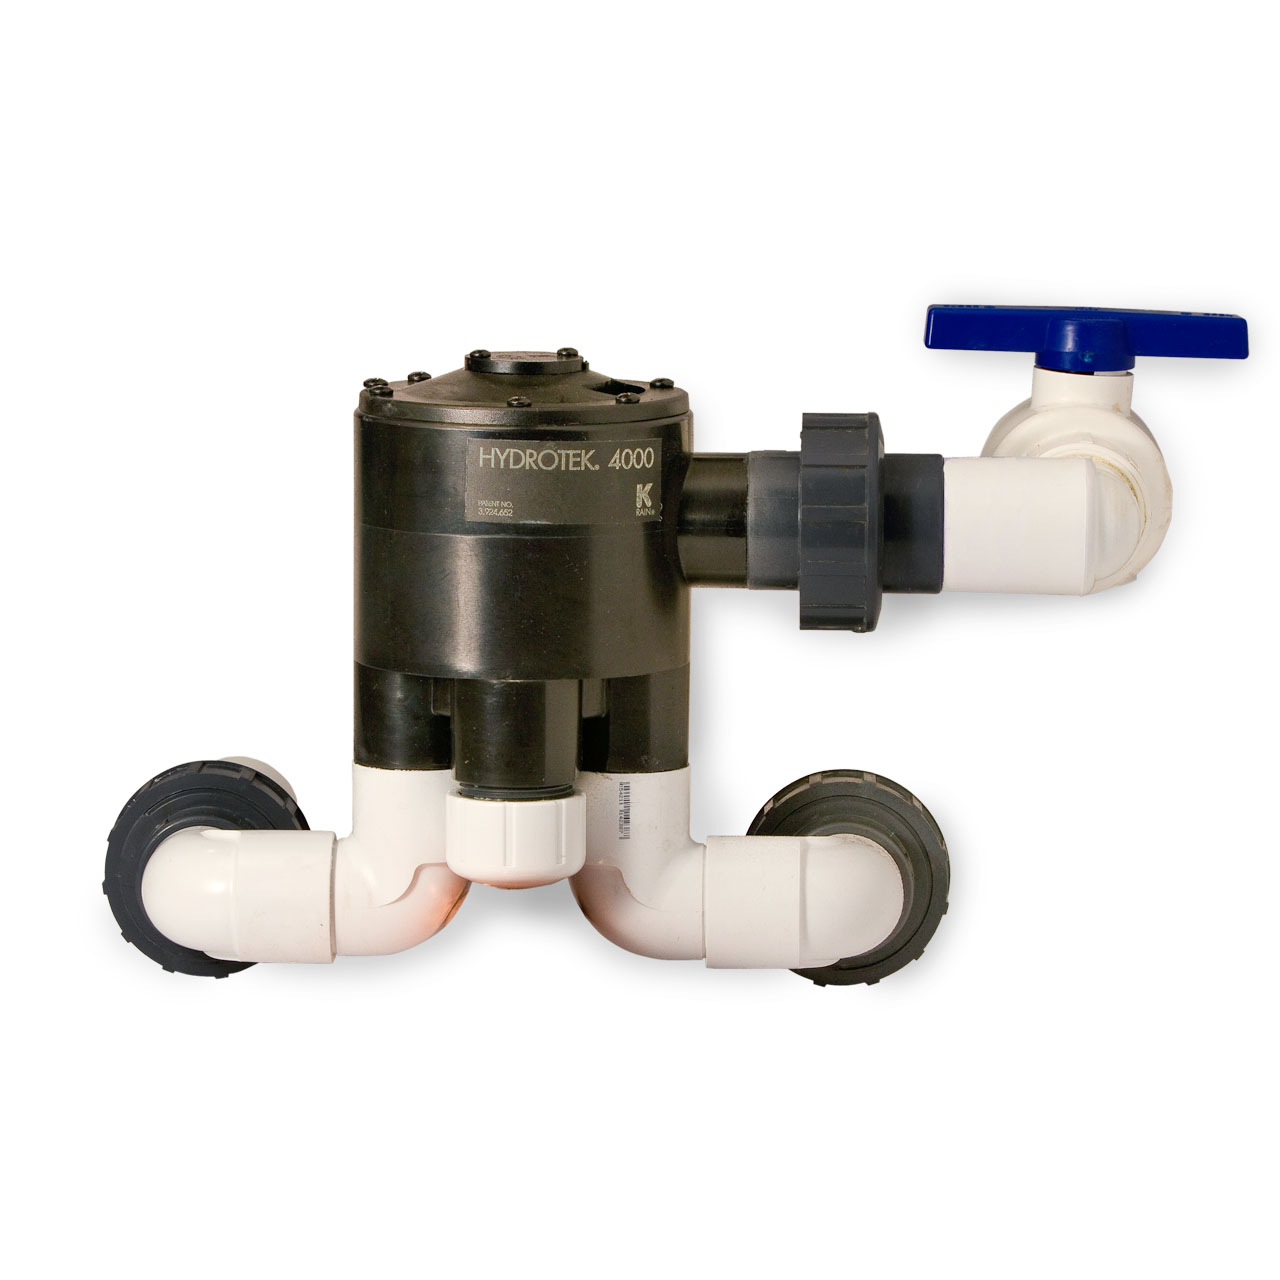 3 way zone valve walbro wt carb diagram orenco systems inc v4402a automatic